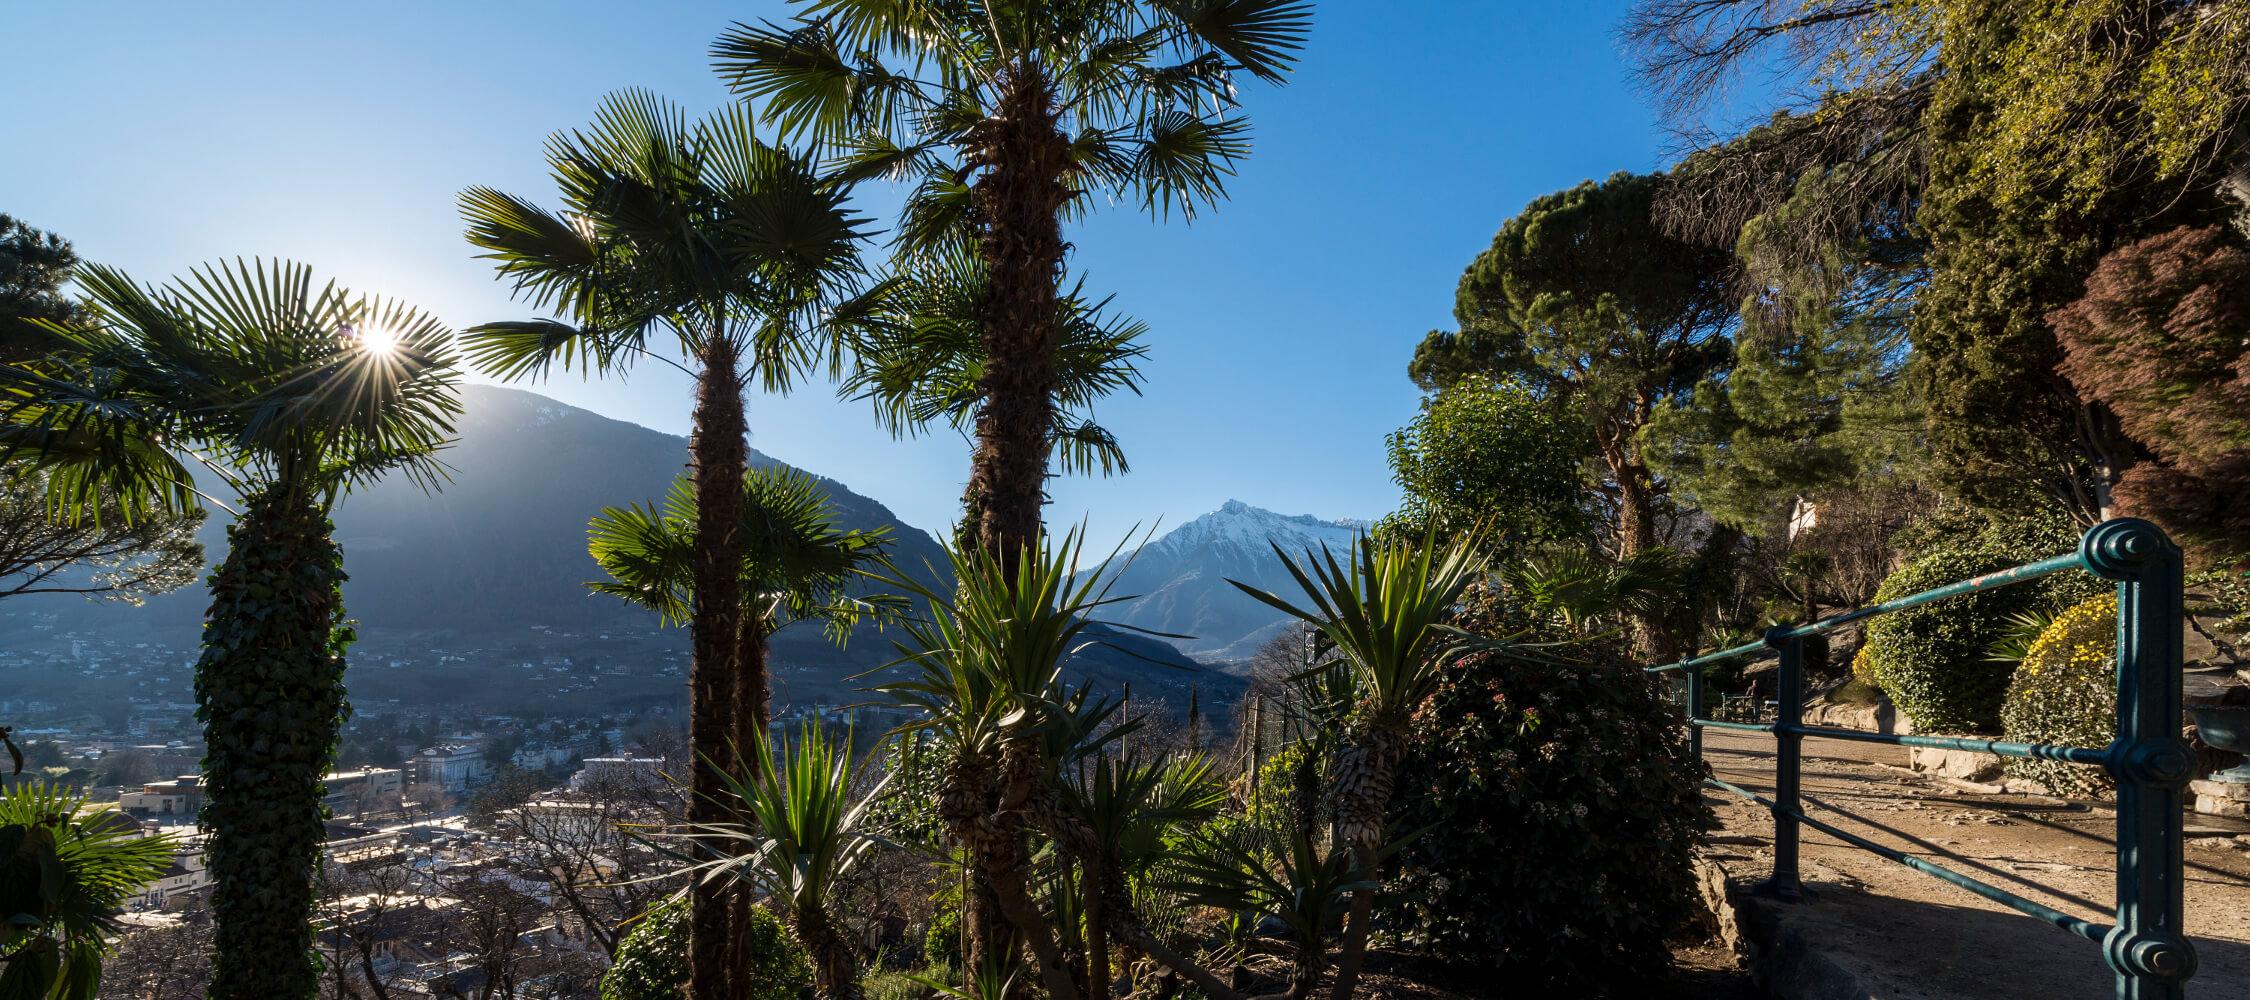 Italien-Trentino_Suedtirol_Alto_Adige_Merano_Meran_Natur_Winter_Tappeinerweg_Panorama_Kurverwaltung-Hannes-Niederkofler_21_2250x1000